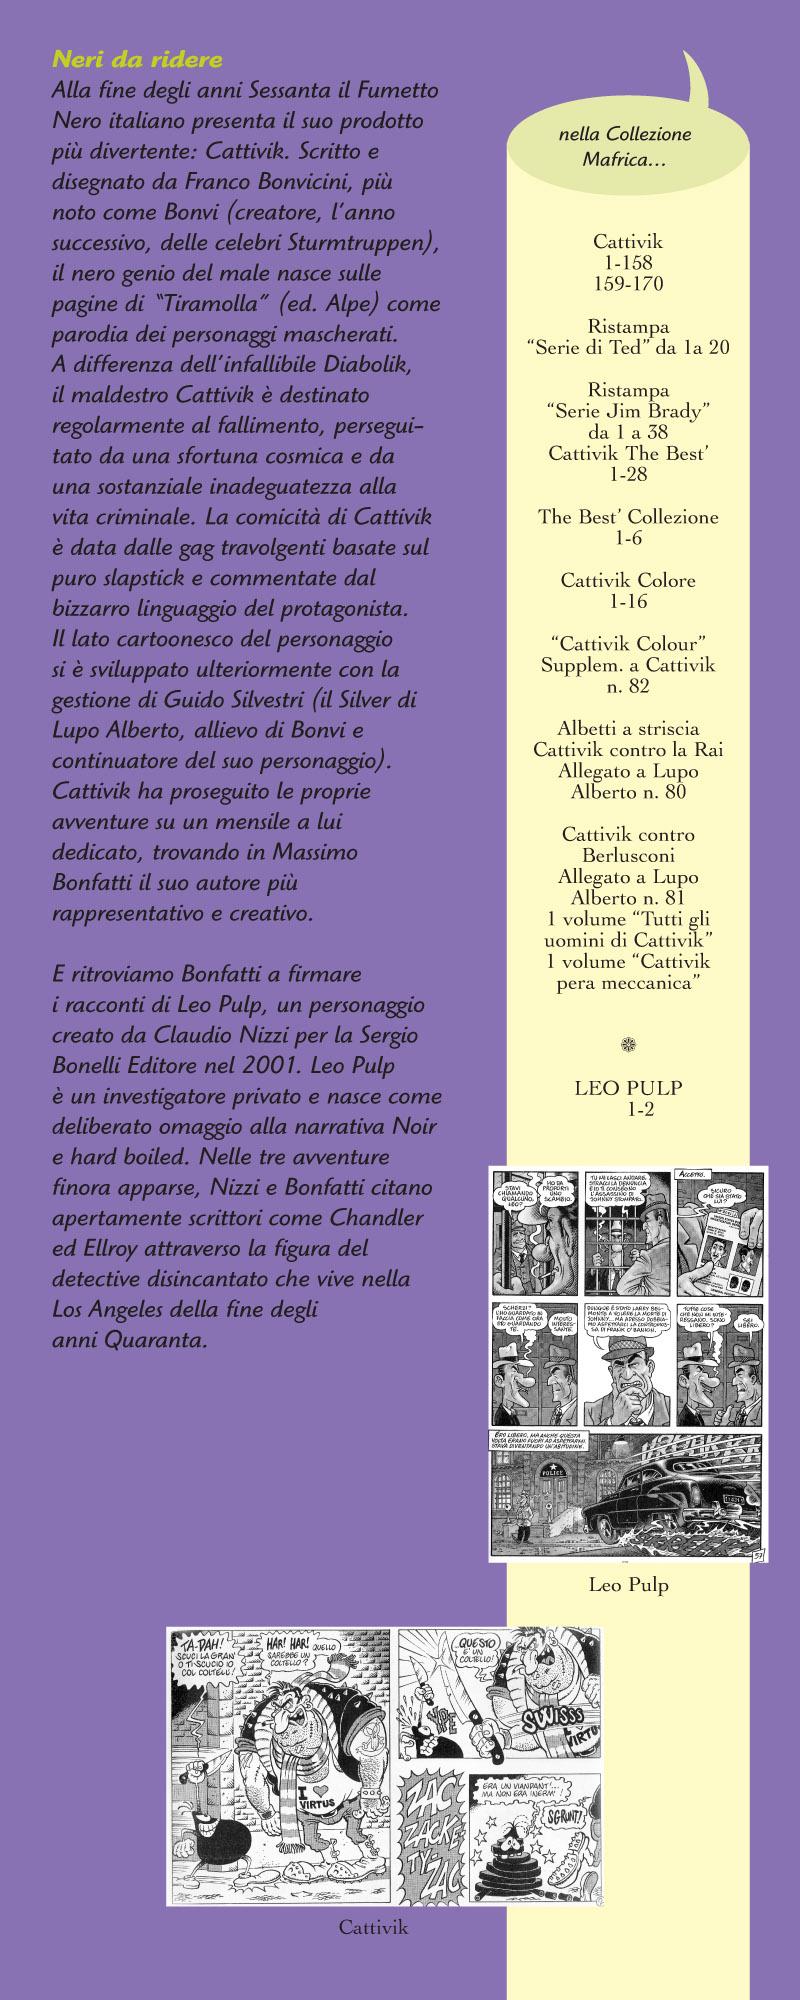 Pannello 5